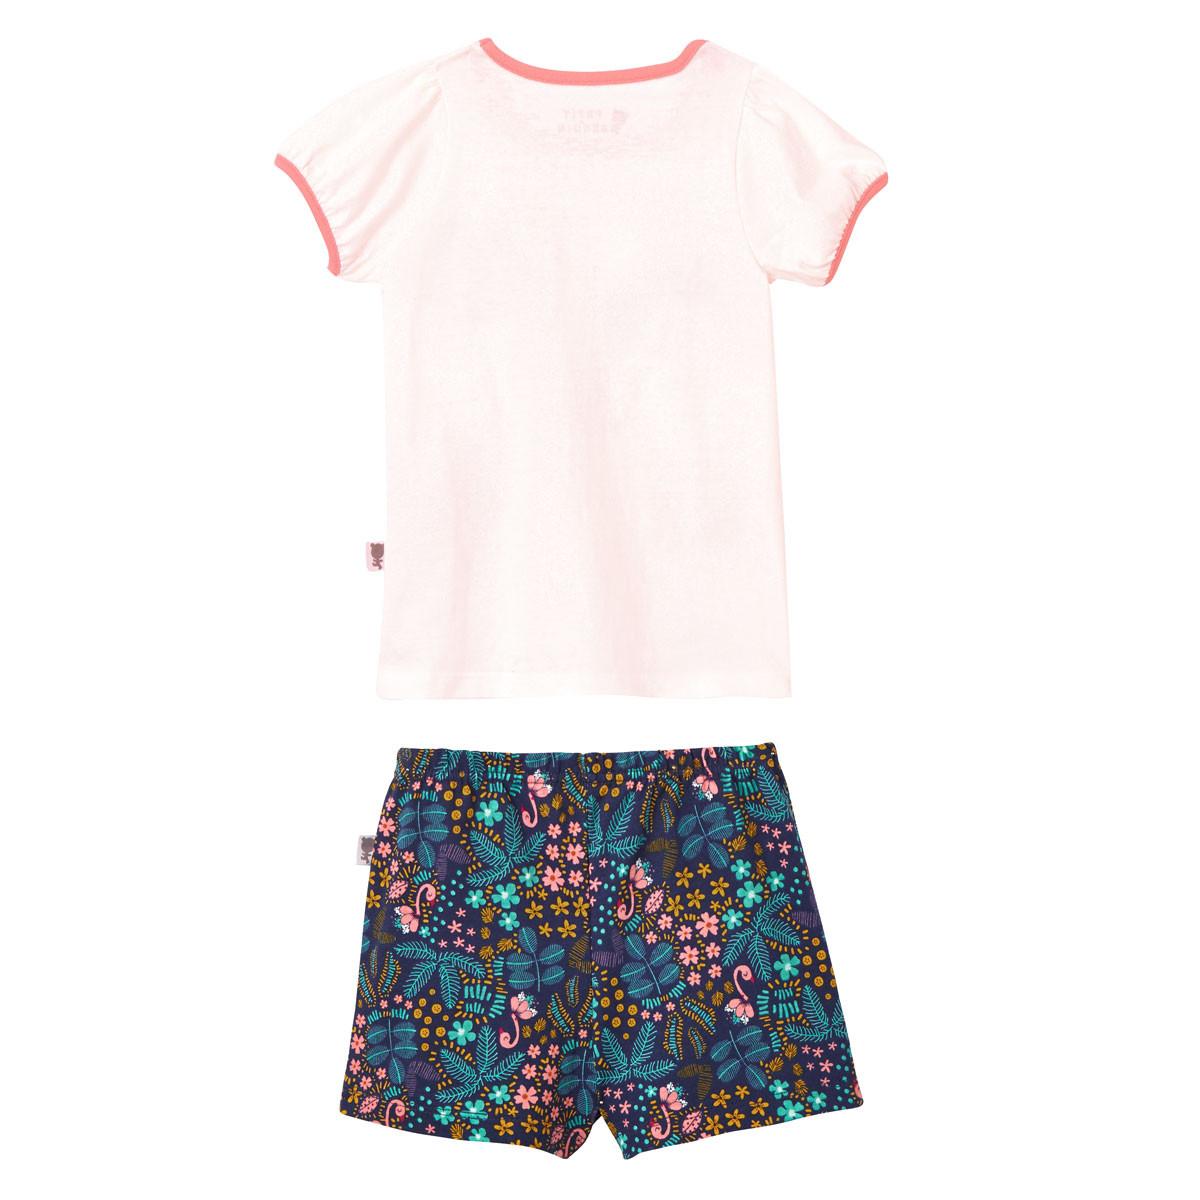 Pyjama manches courtes fille Miss Blabla dos